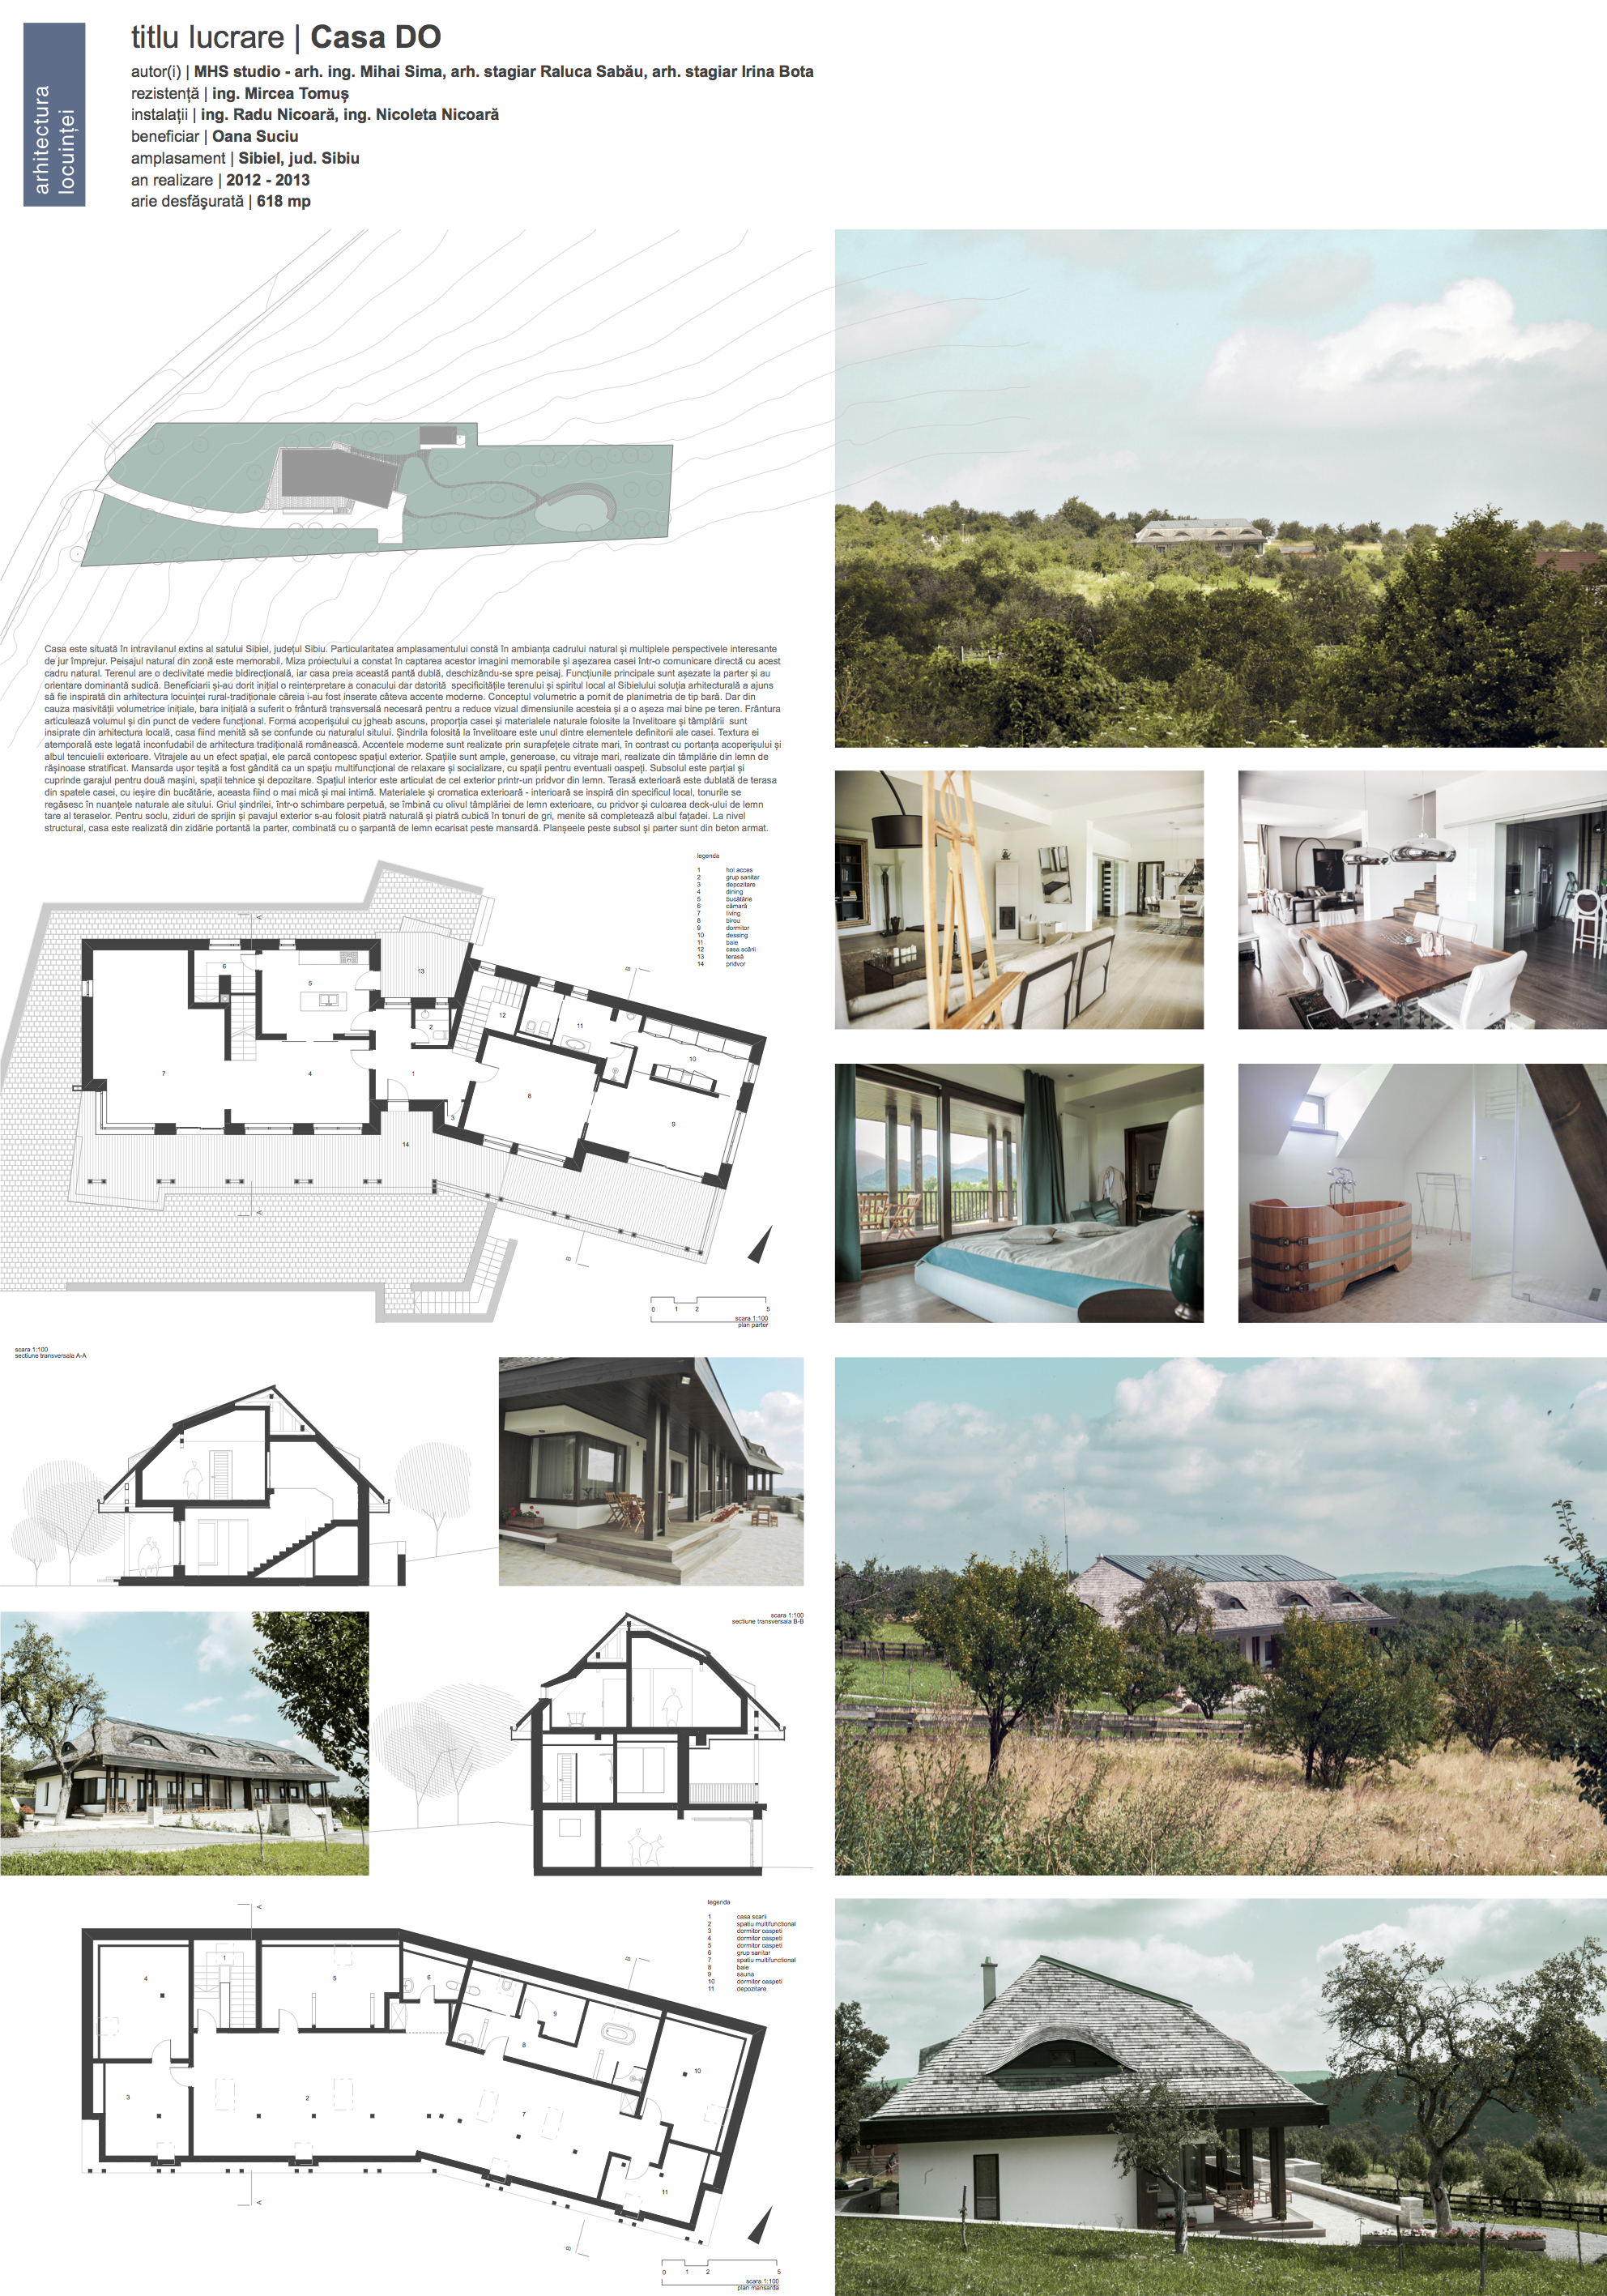 MHS studio - Casa DO